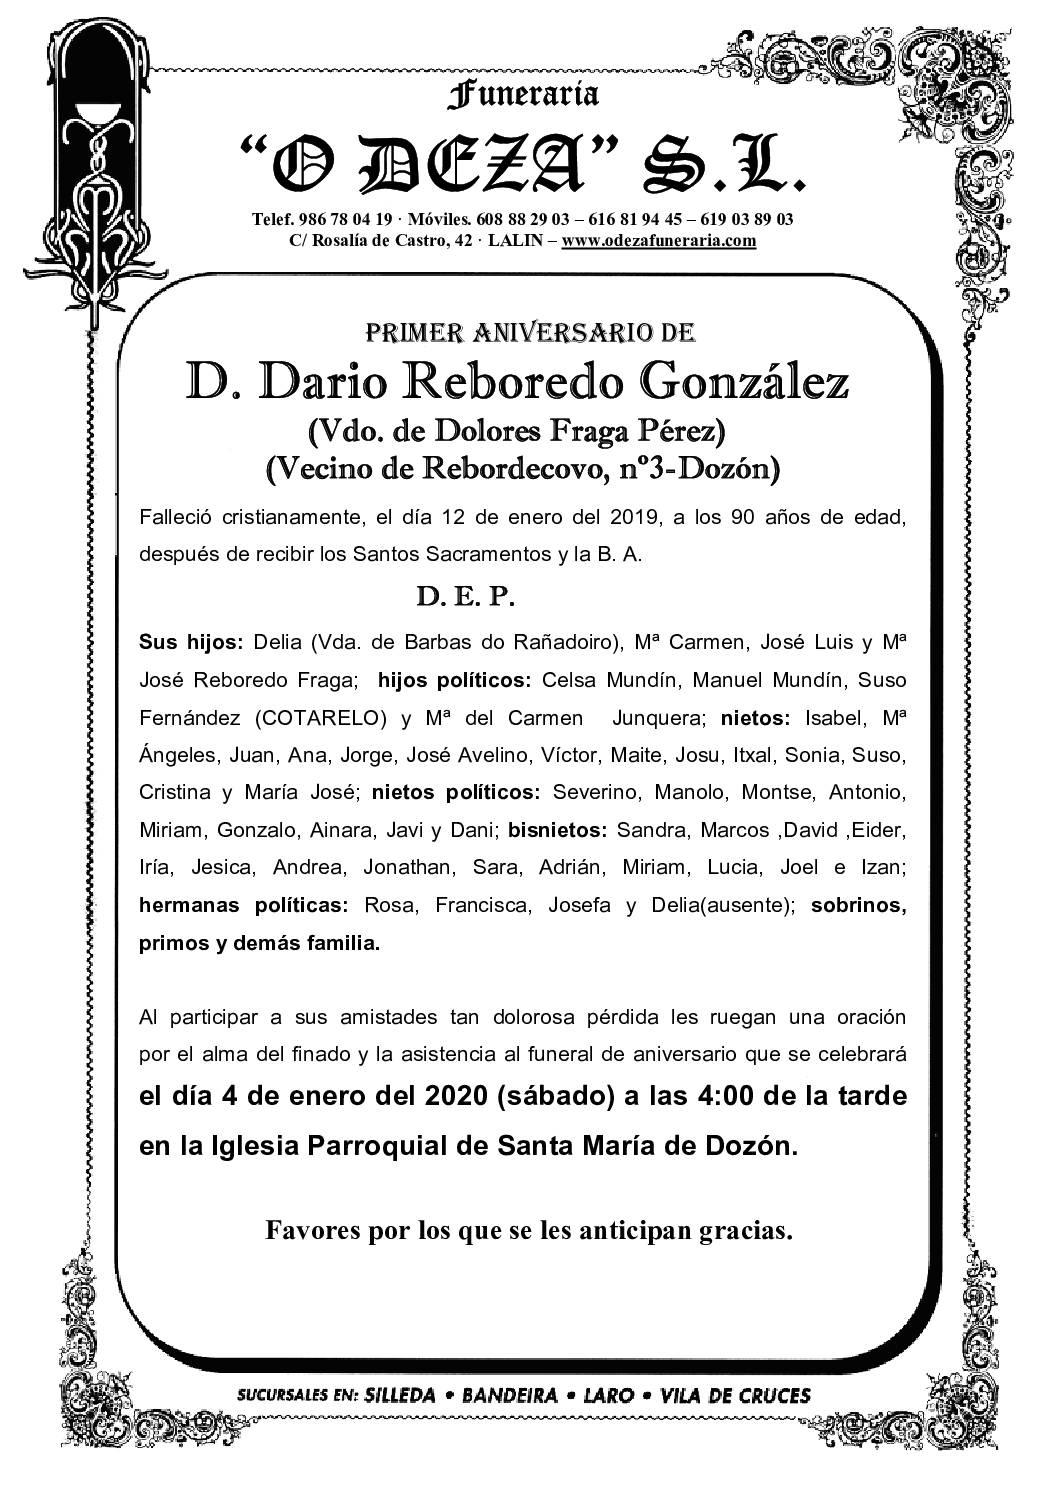 D. DARIO REBOREDO GONZÁLEZ